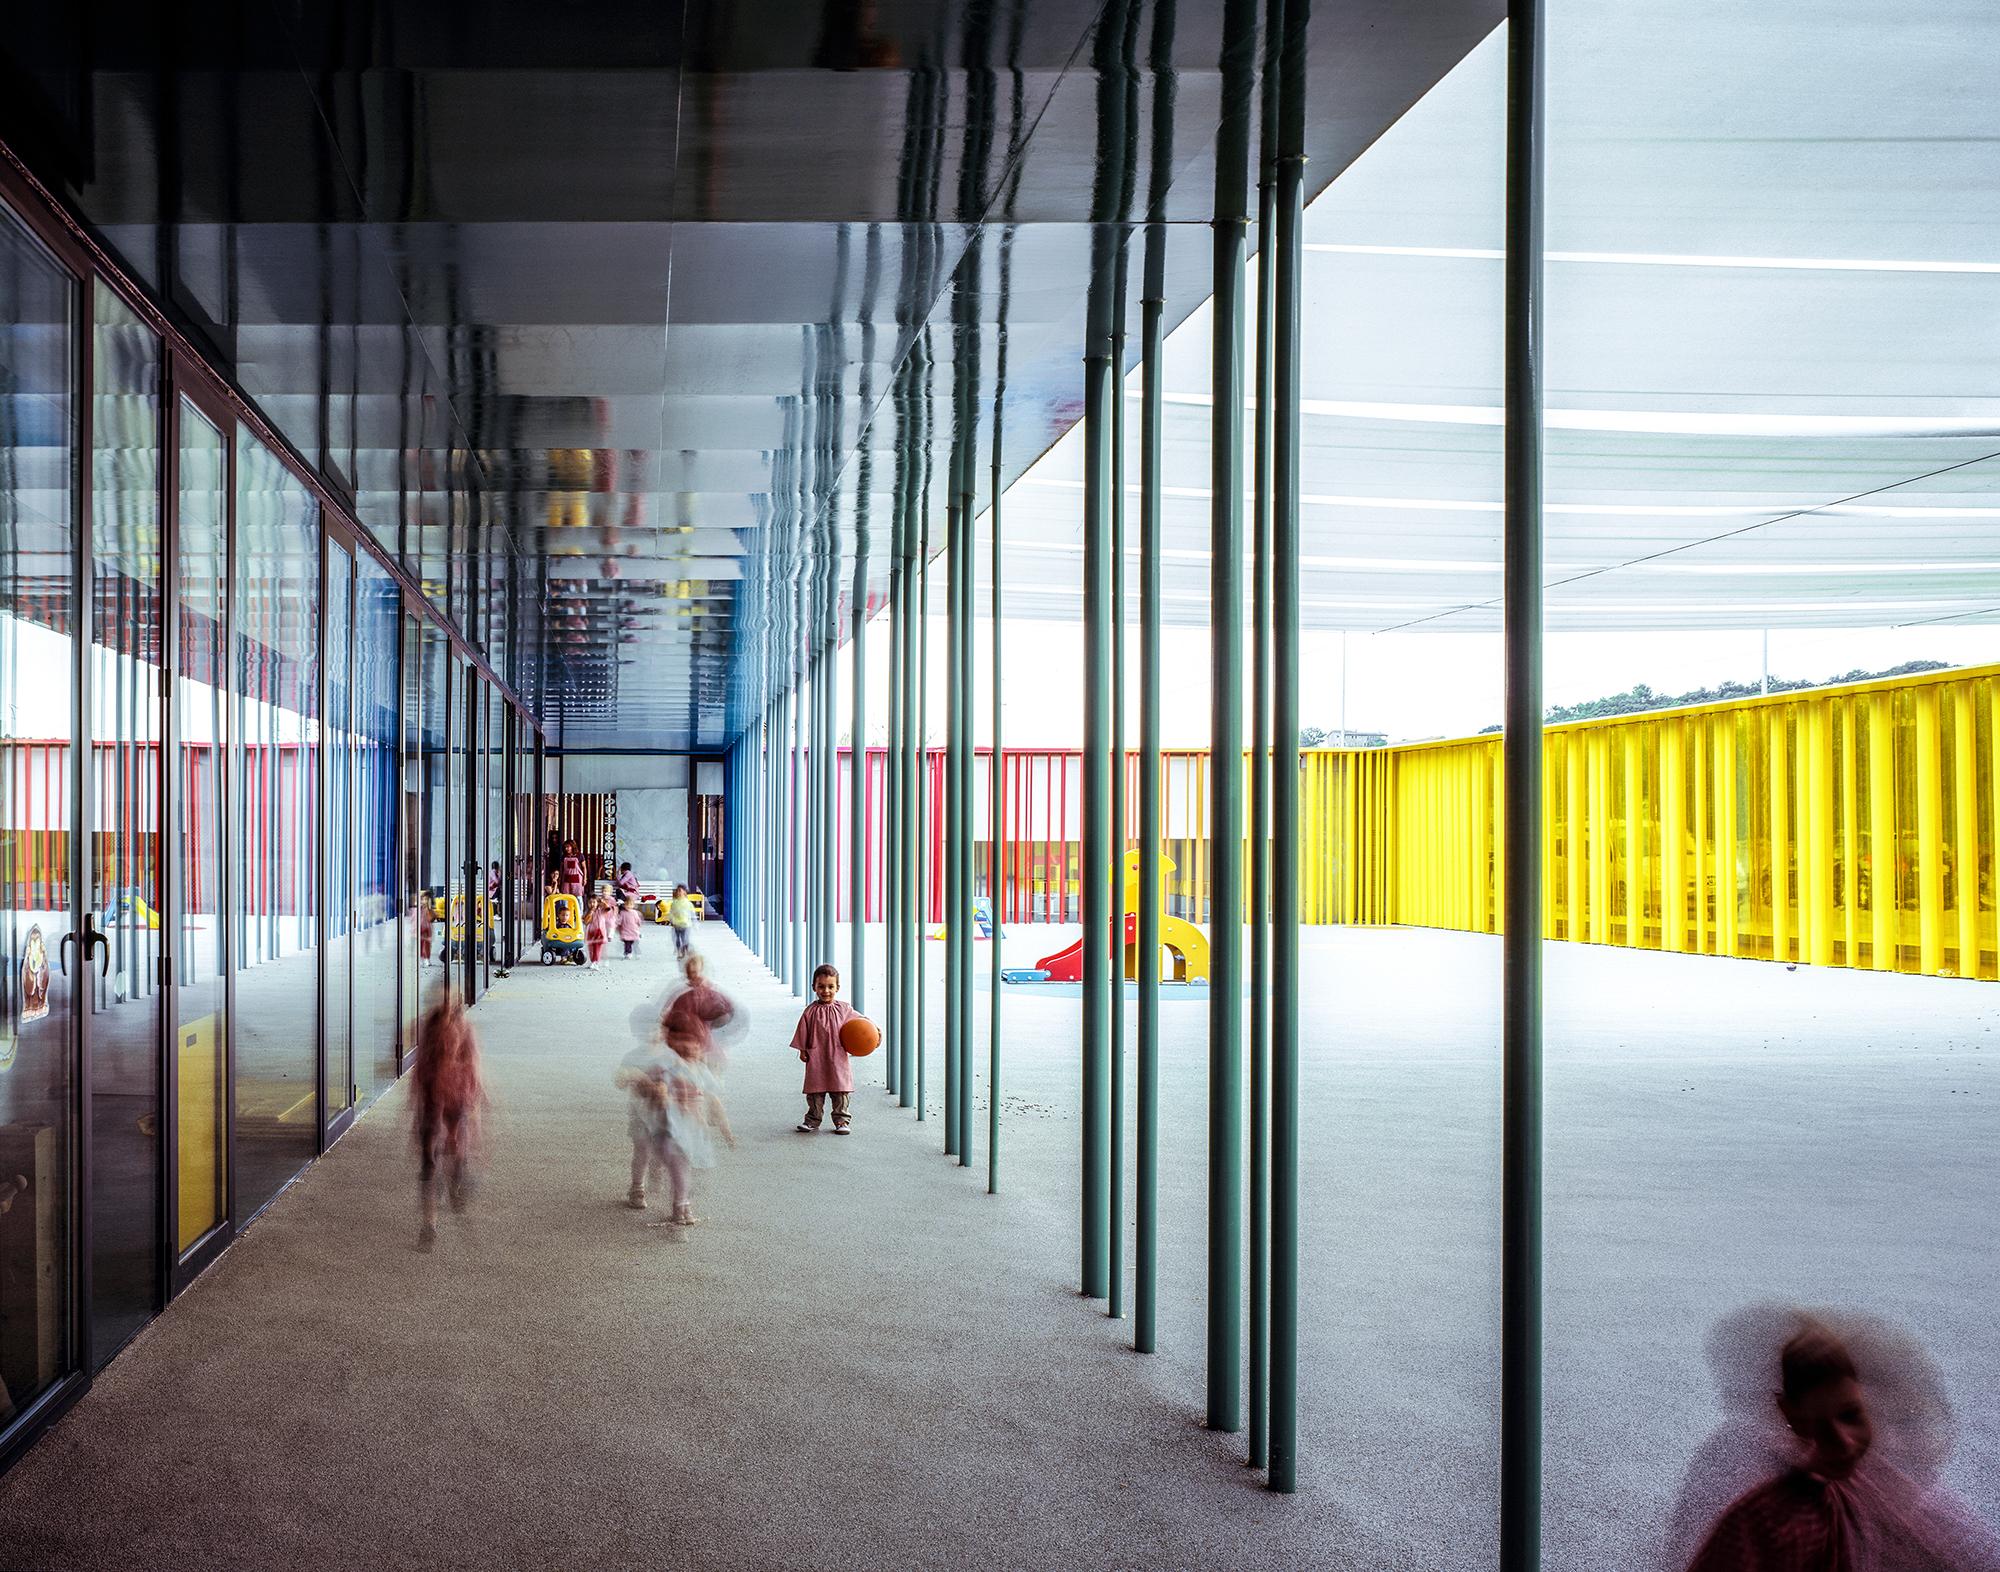 Escuela infantil El petit Comte (Besalú, Girona)